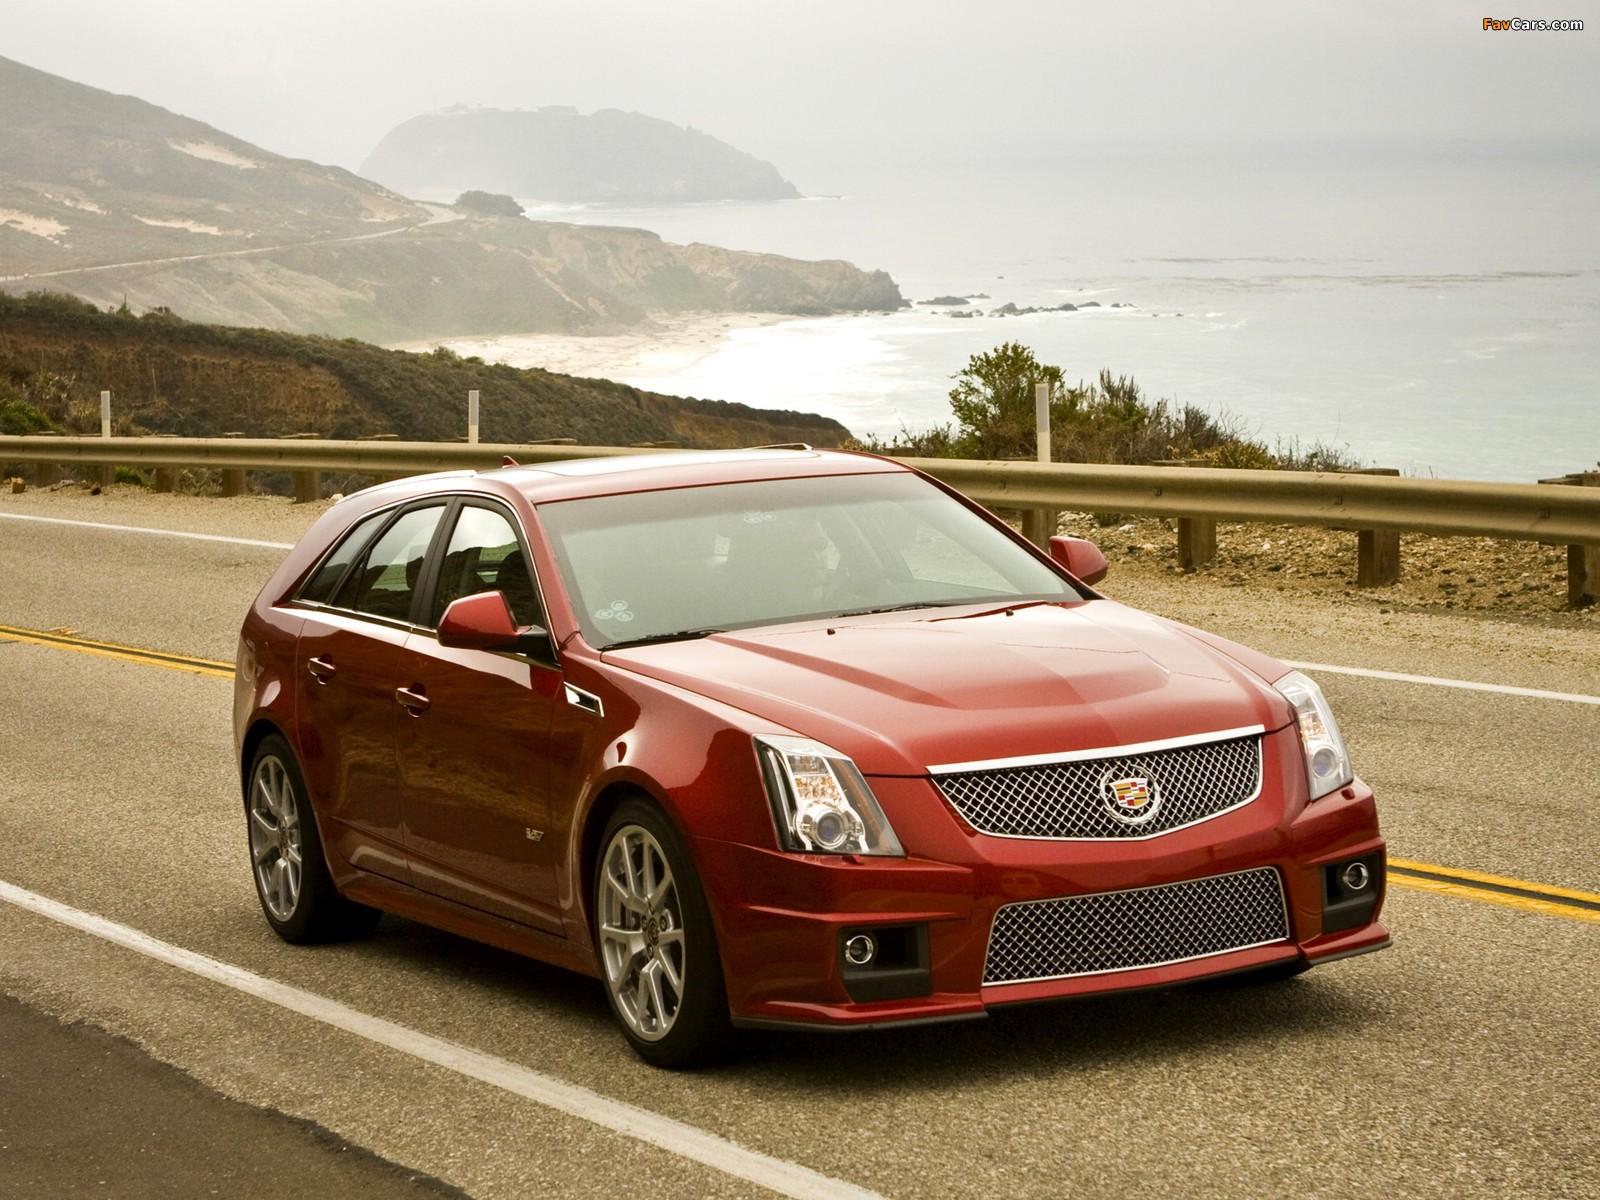 Cadillac CTS-V Sport Wagon 2010 photos (1600 x 1200)